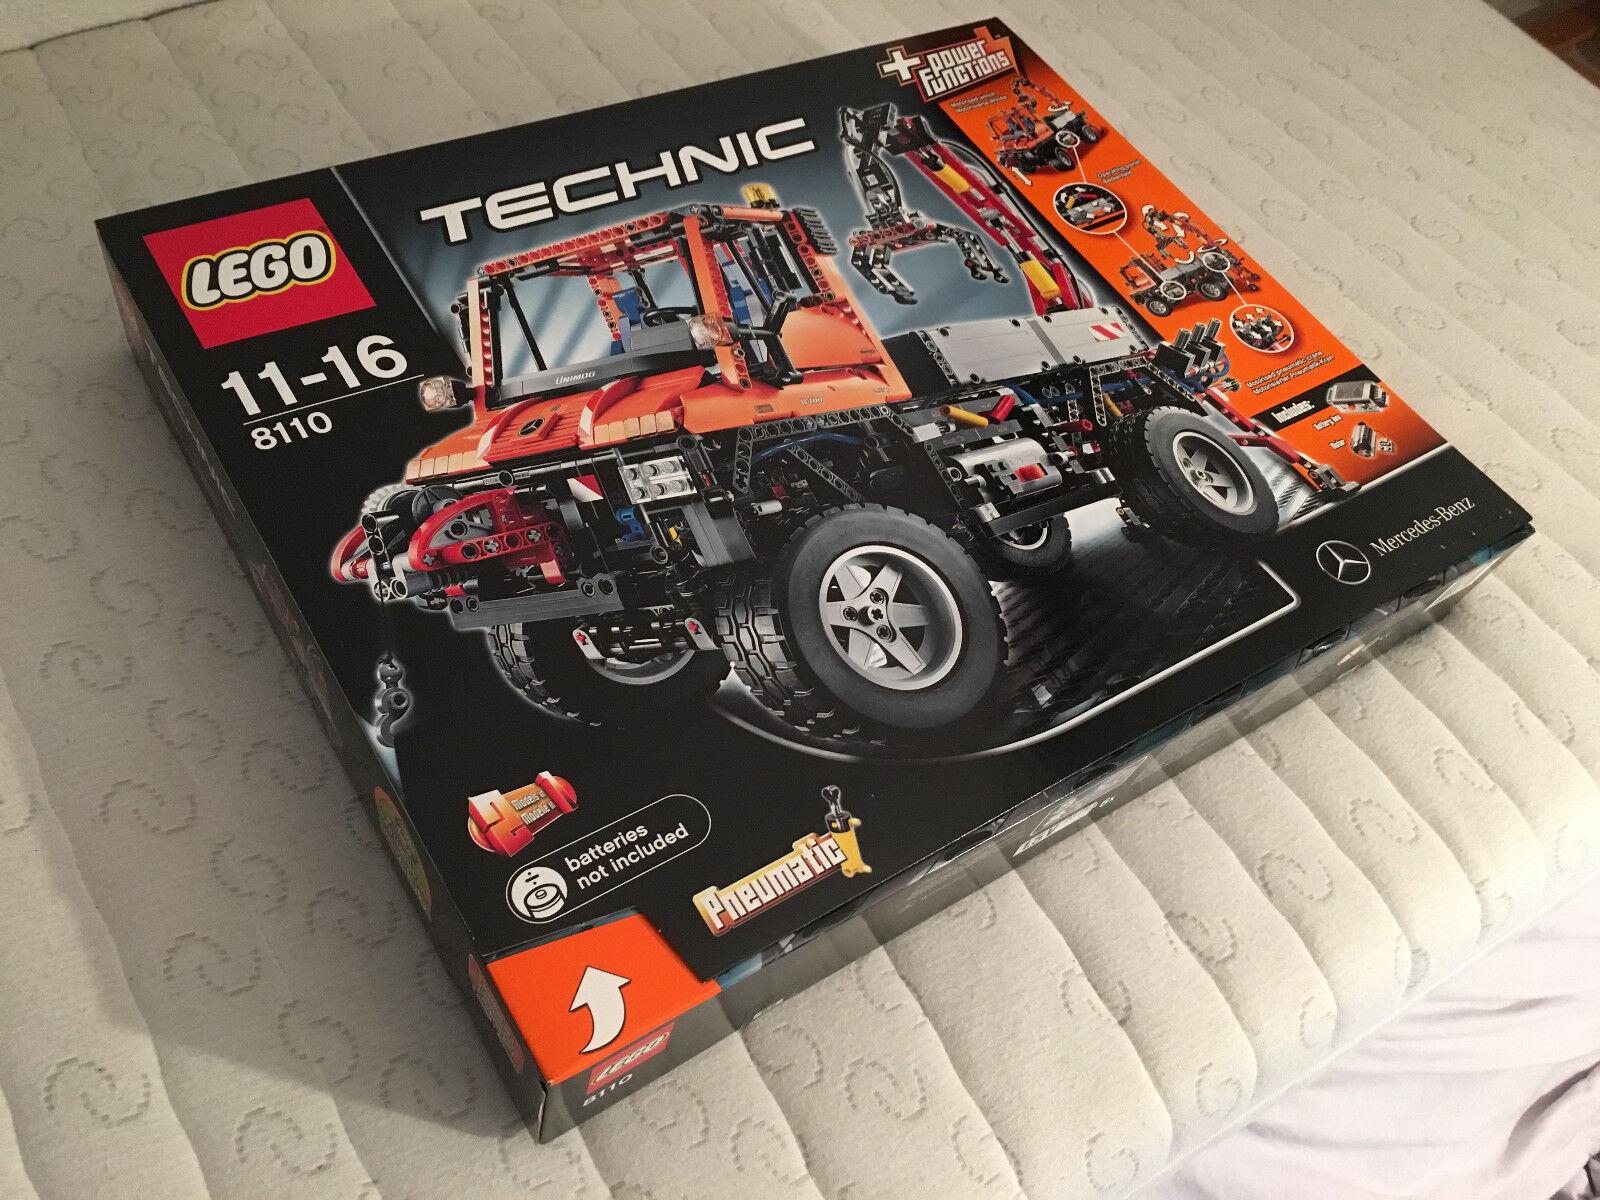 LEGO Technic Unimog U400 (8110) NEU UNGEÖFFNET